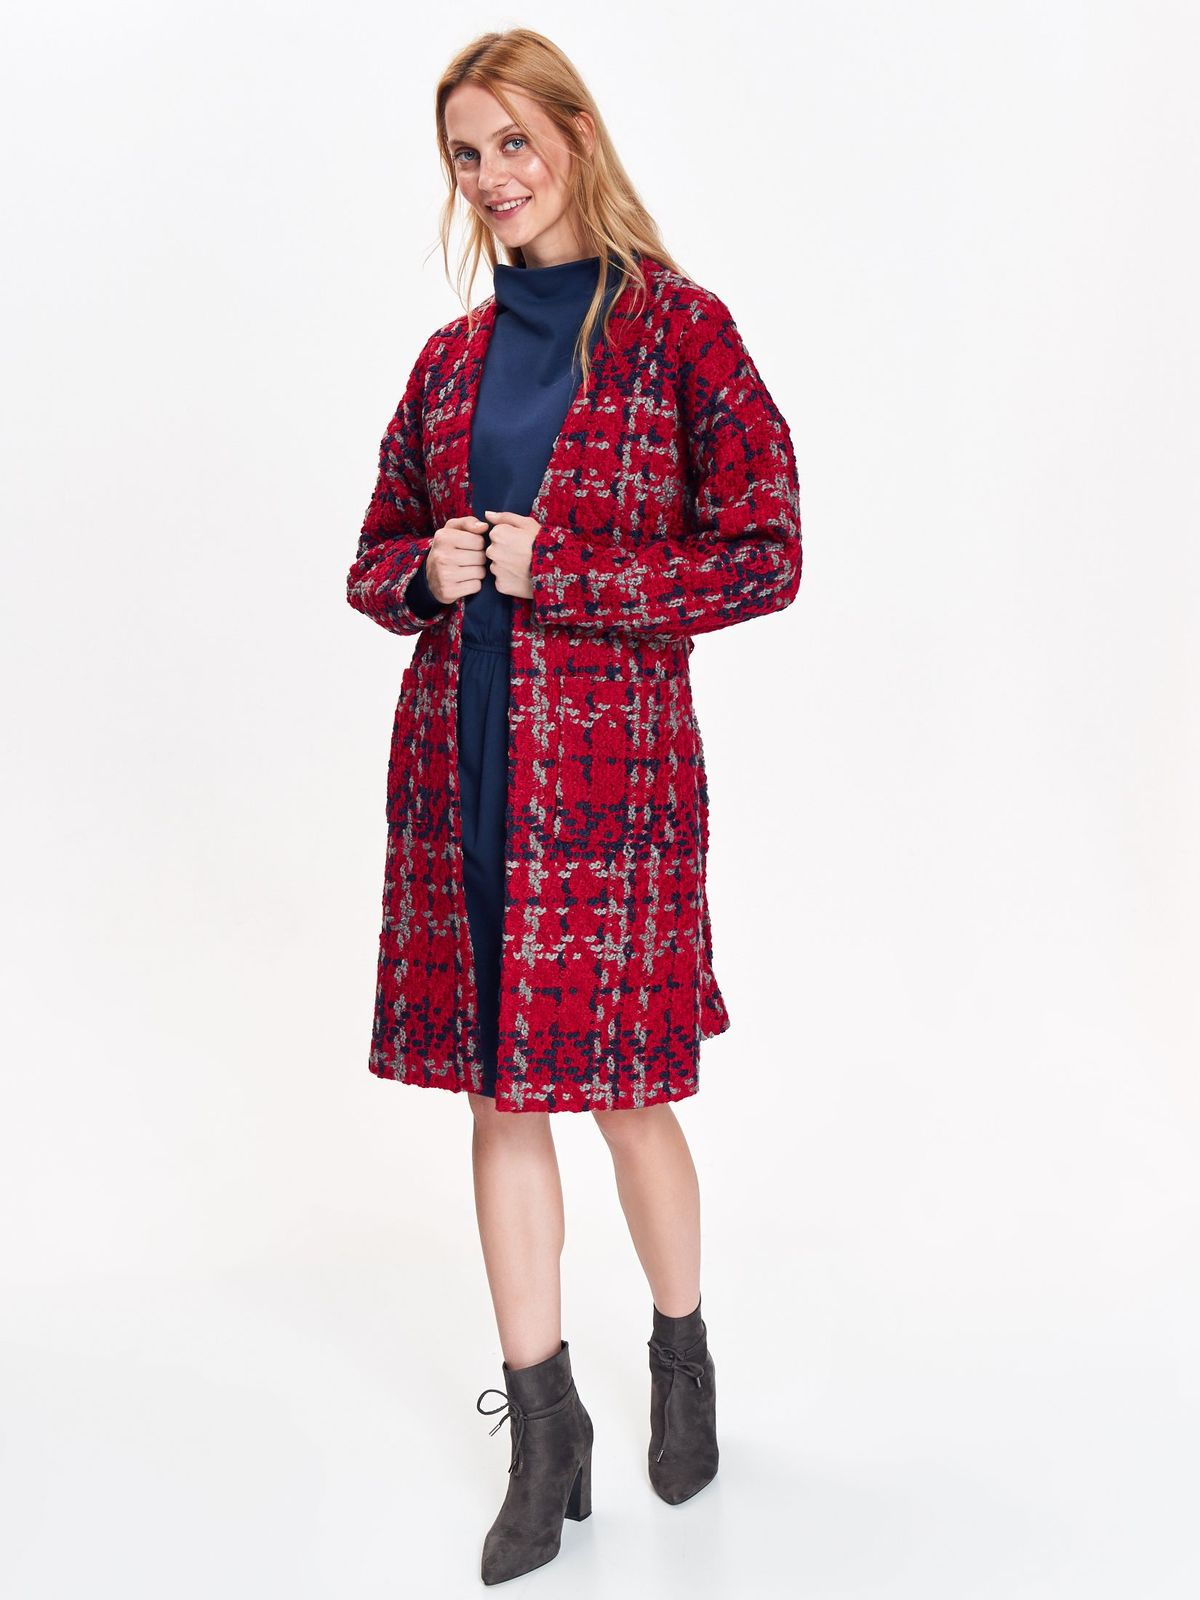 550ea66e262a Style Icon Boutique - Γυναικεία Πανωφόρια - Φθηνότερα Προϊόντα - Σελίδα 8